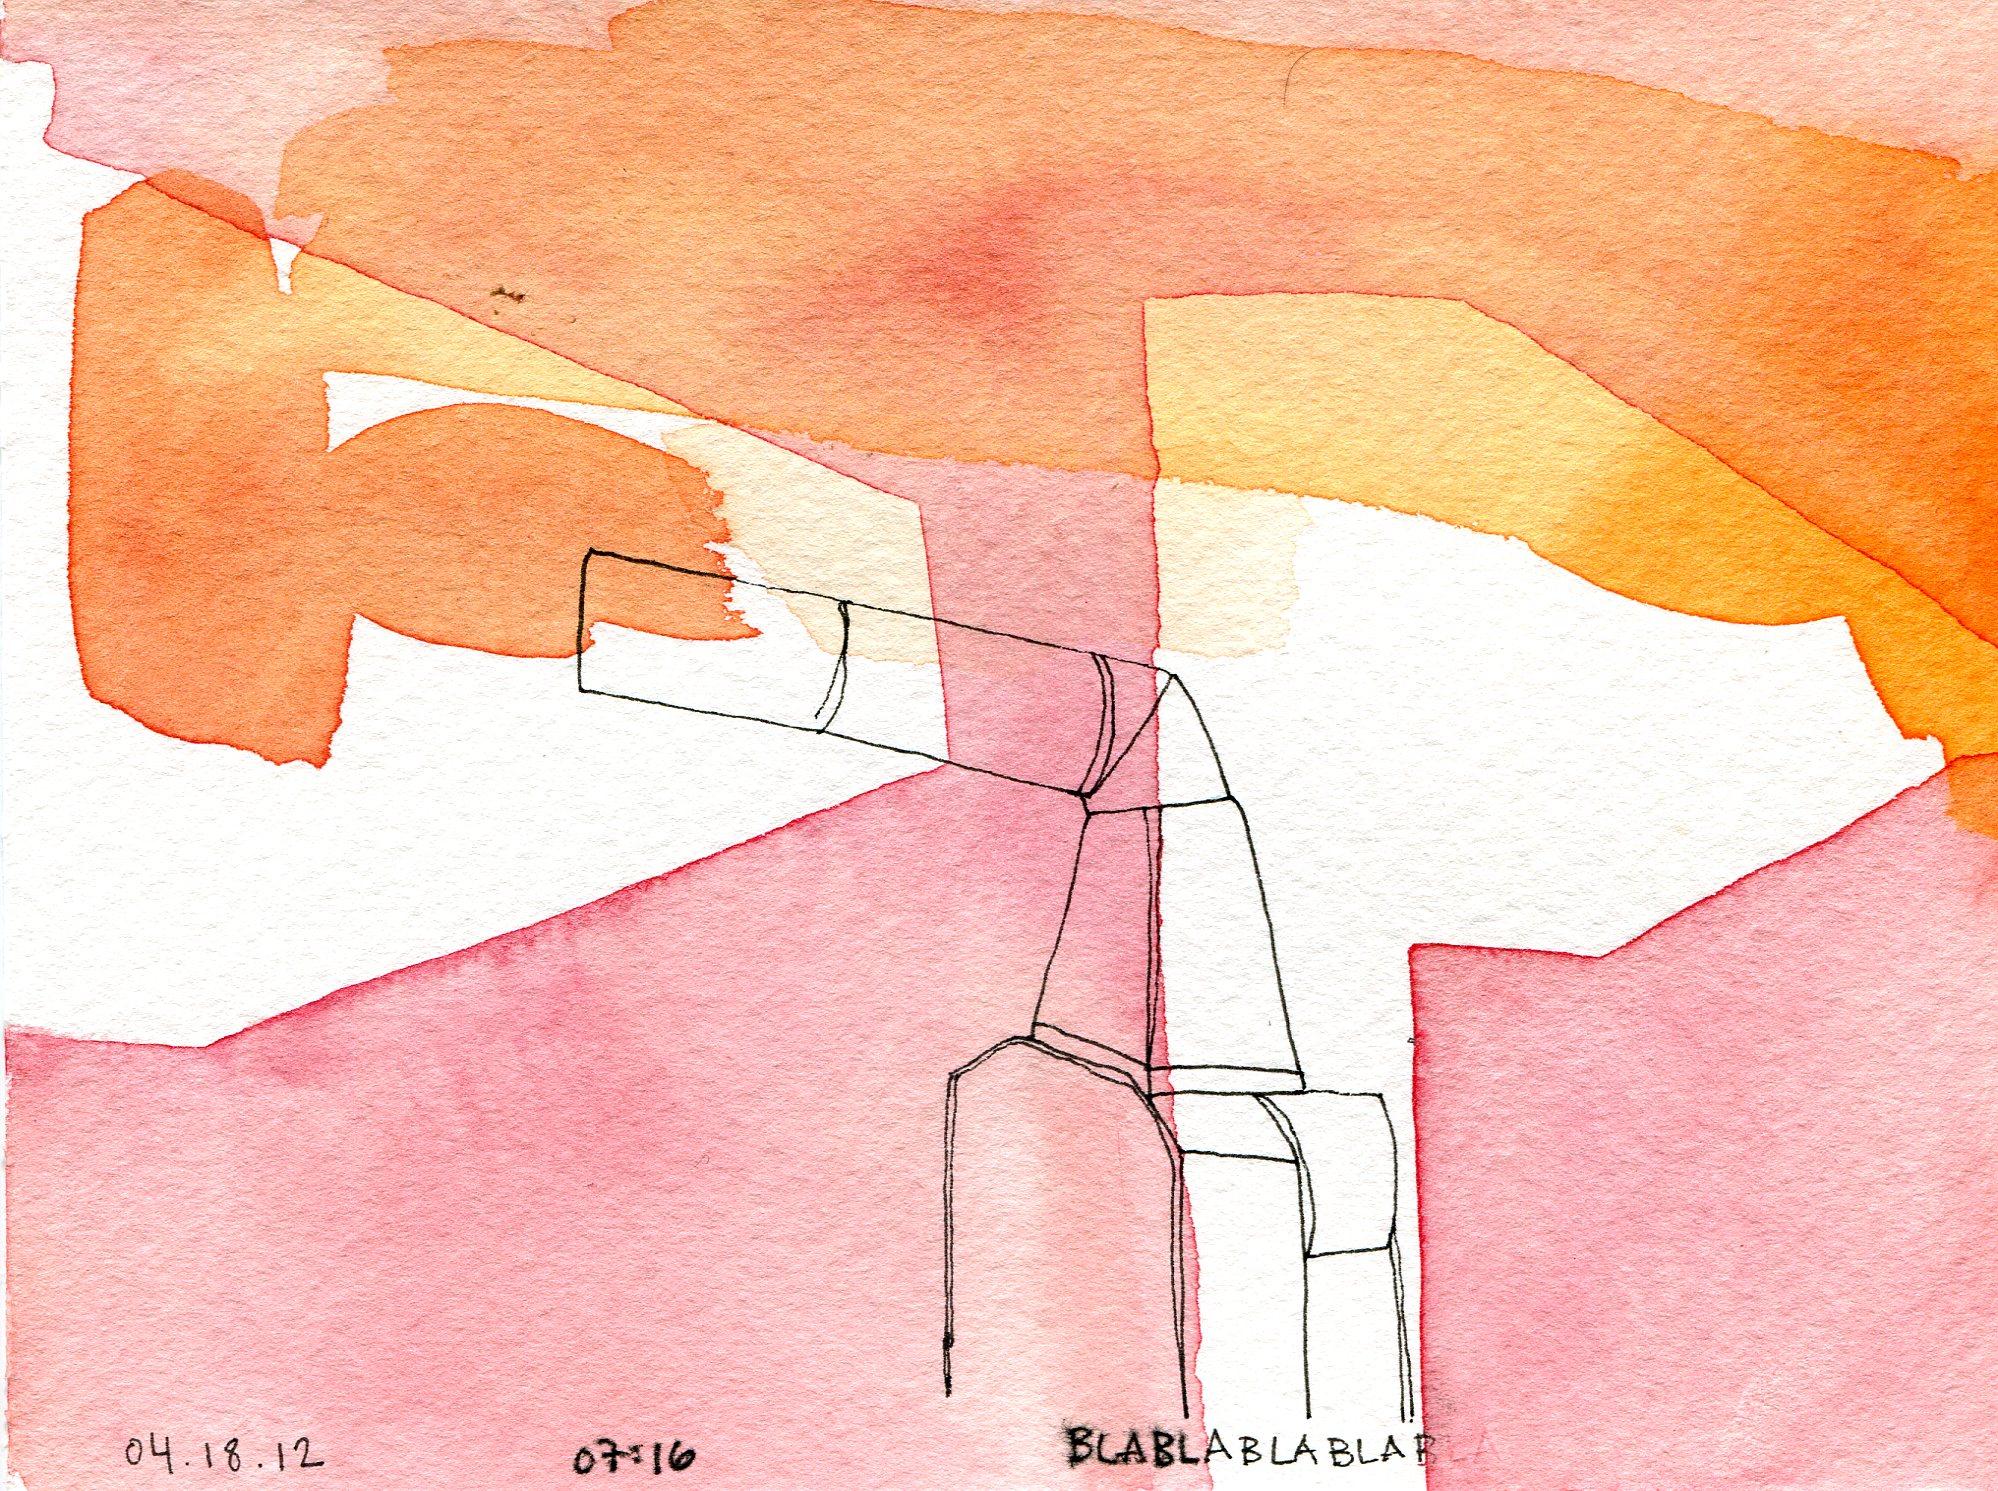 2012-04-21 drawing004.jpg